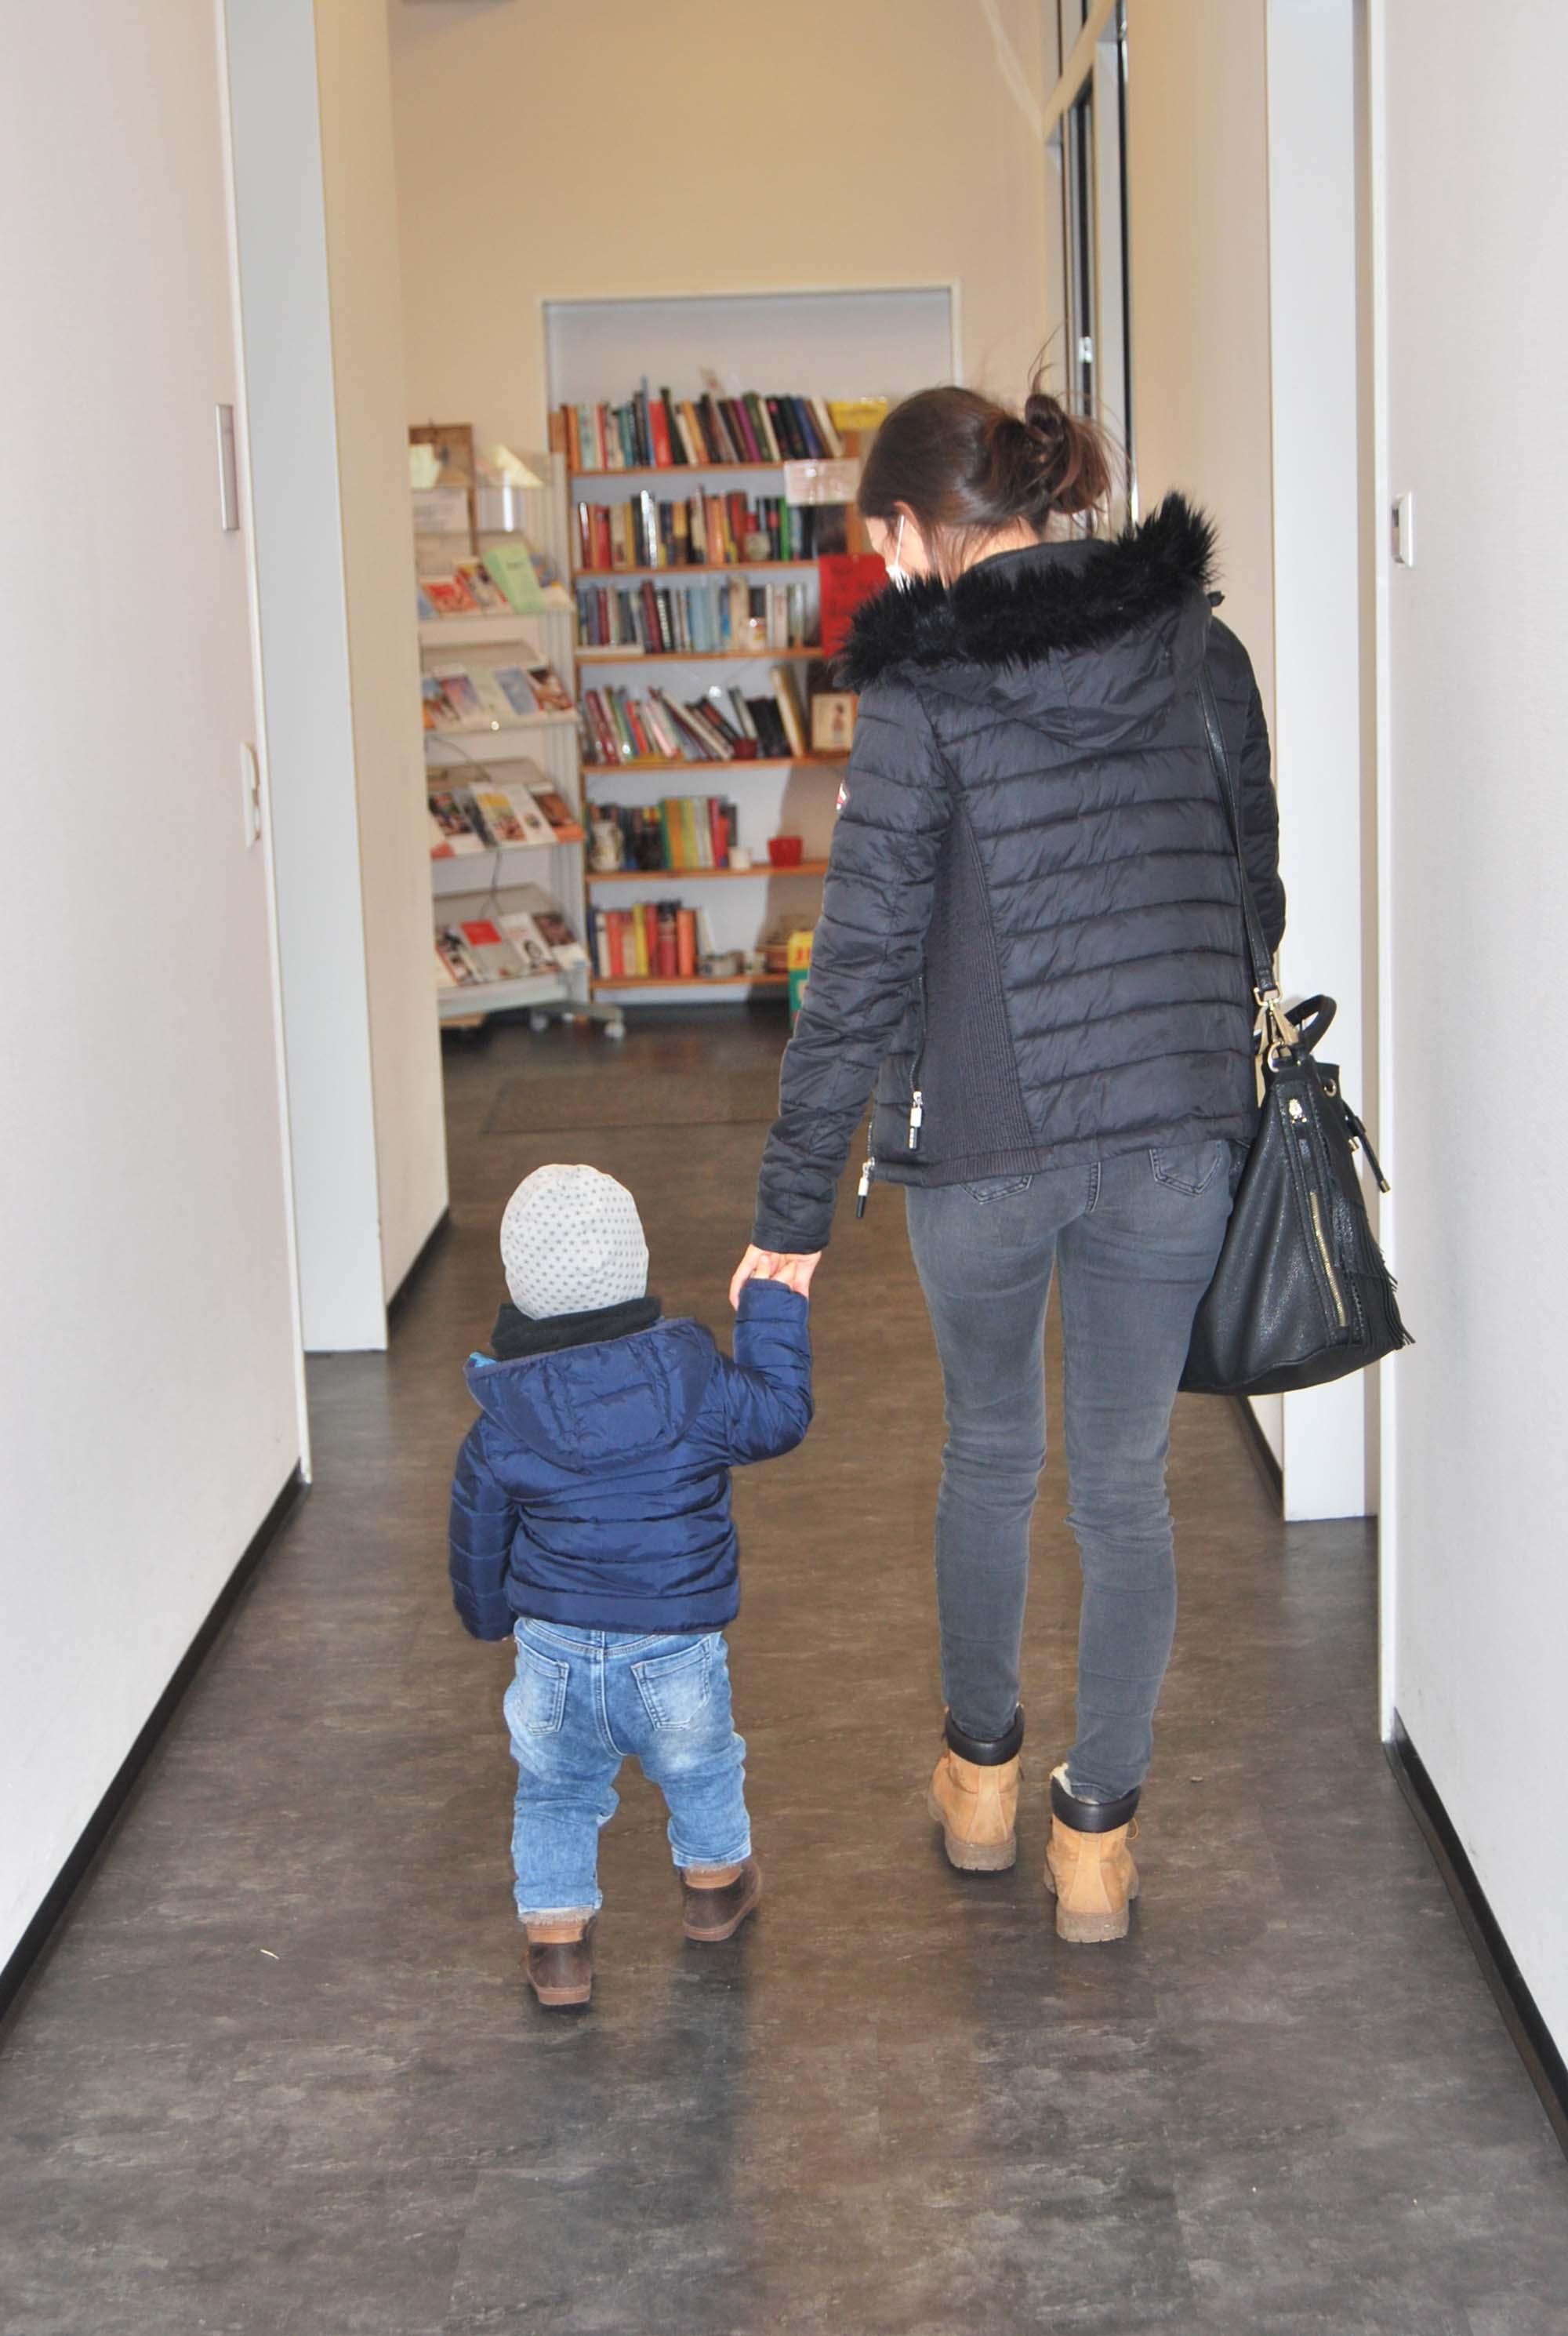 2021-9-10-HA-Caritasverband Kinzigtal- Familienpaten gesucht-Frau mit Kind_2